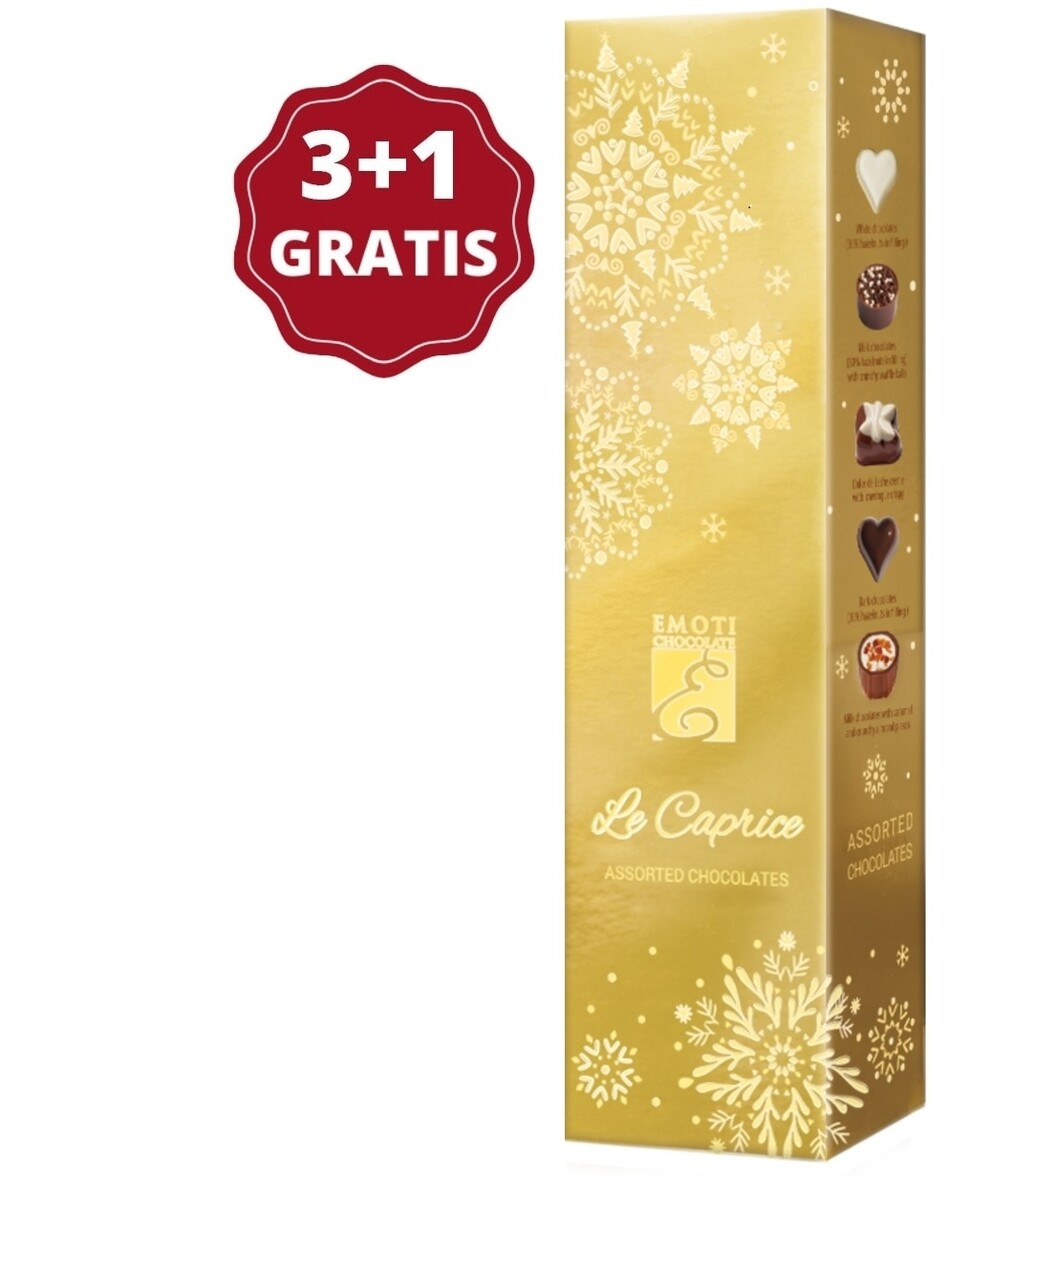 Pachet 3+1 Emoti Le Caprice (Assorted Chocolates) 65g